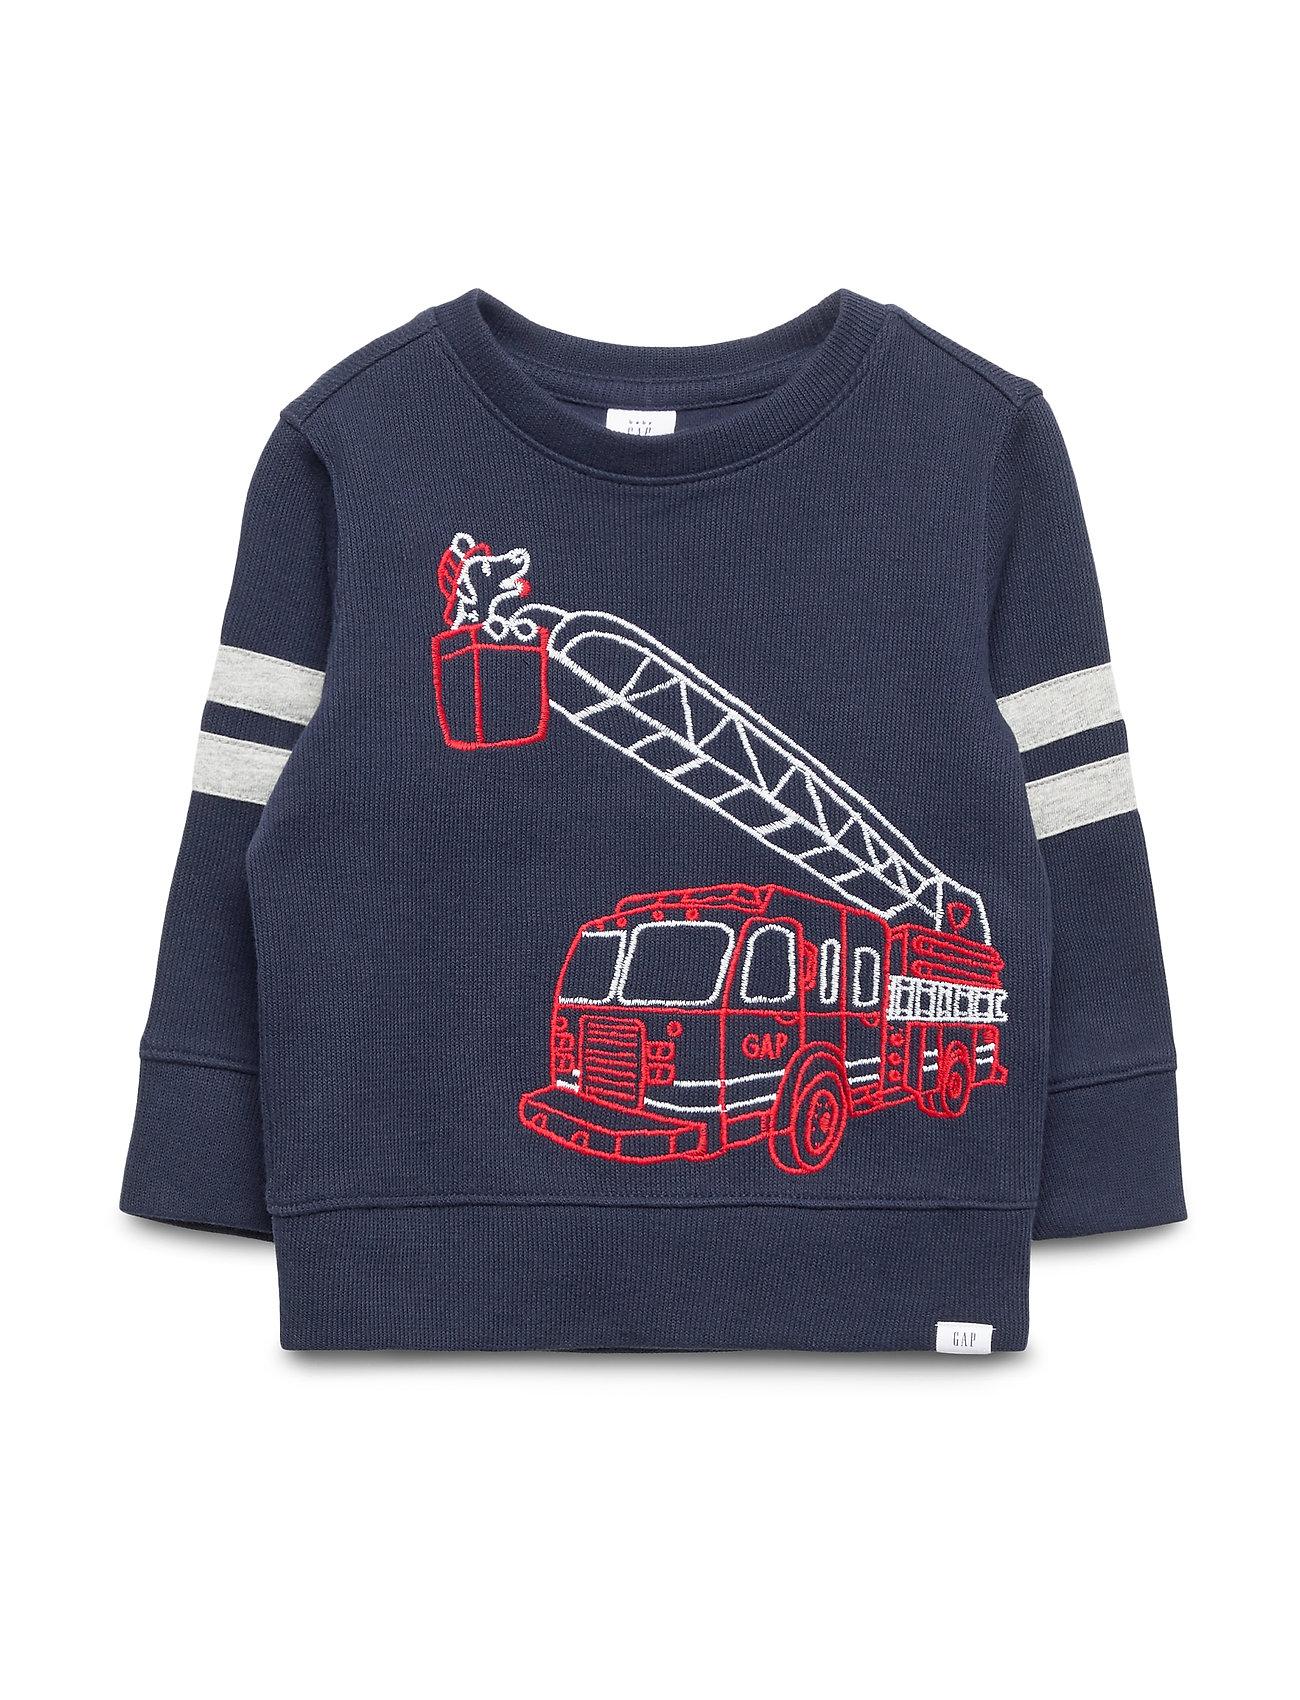 GAP Toddler Crewneck Sweatshirt - BLUE GALAXY